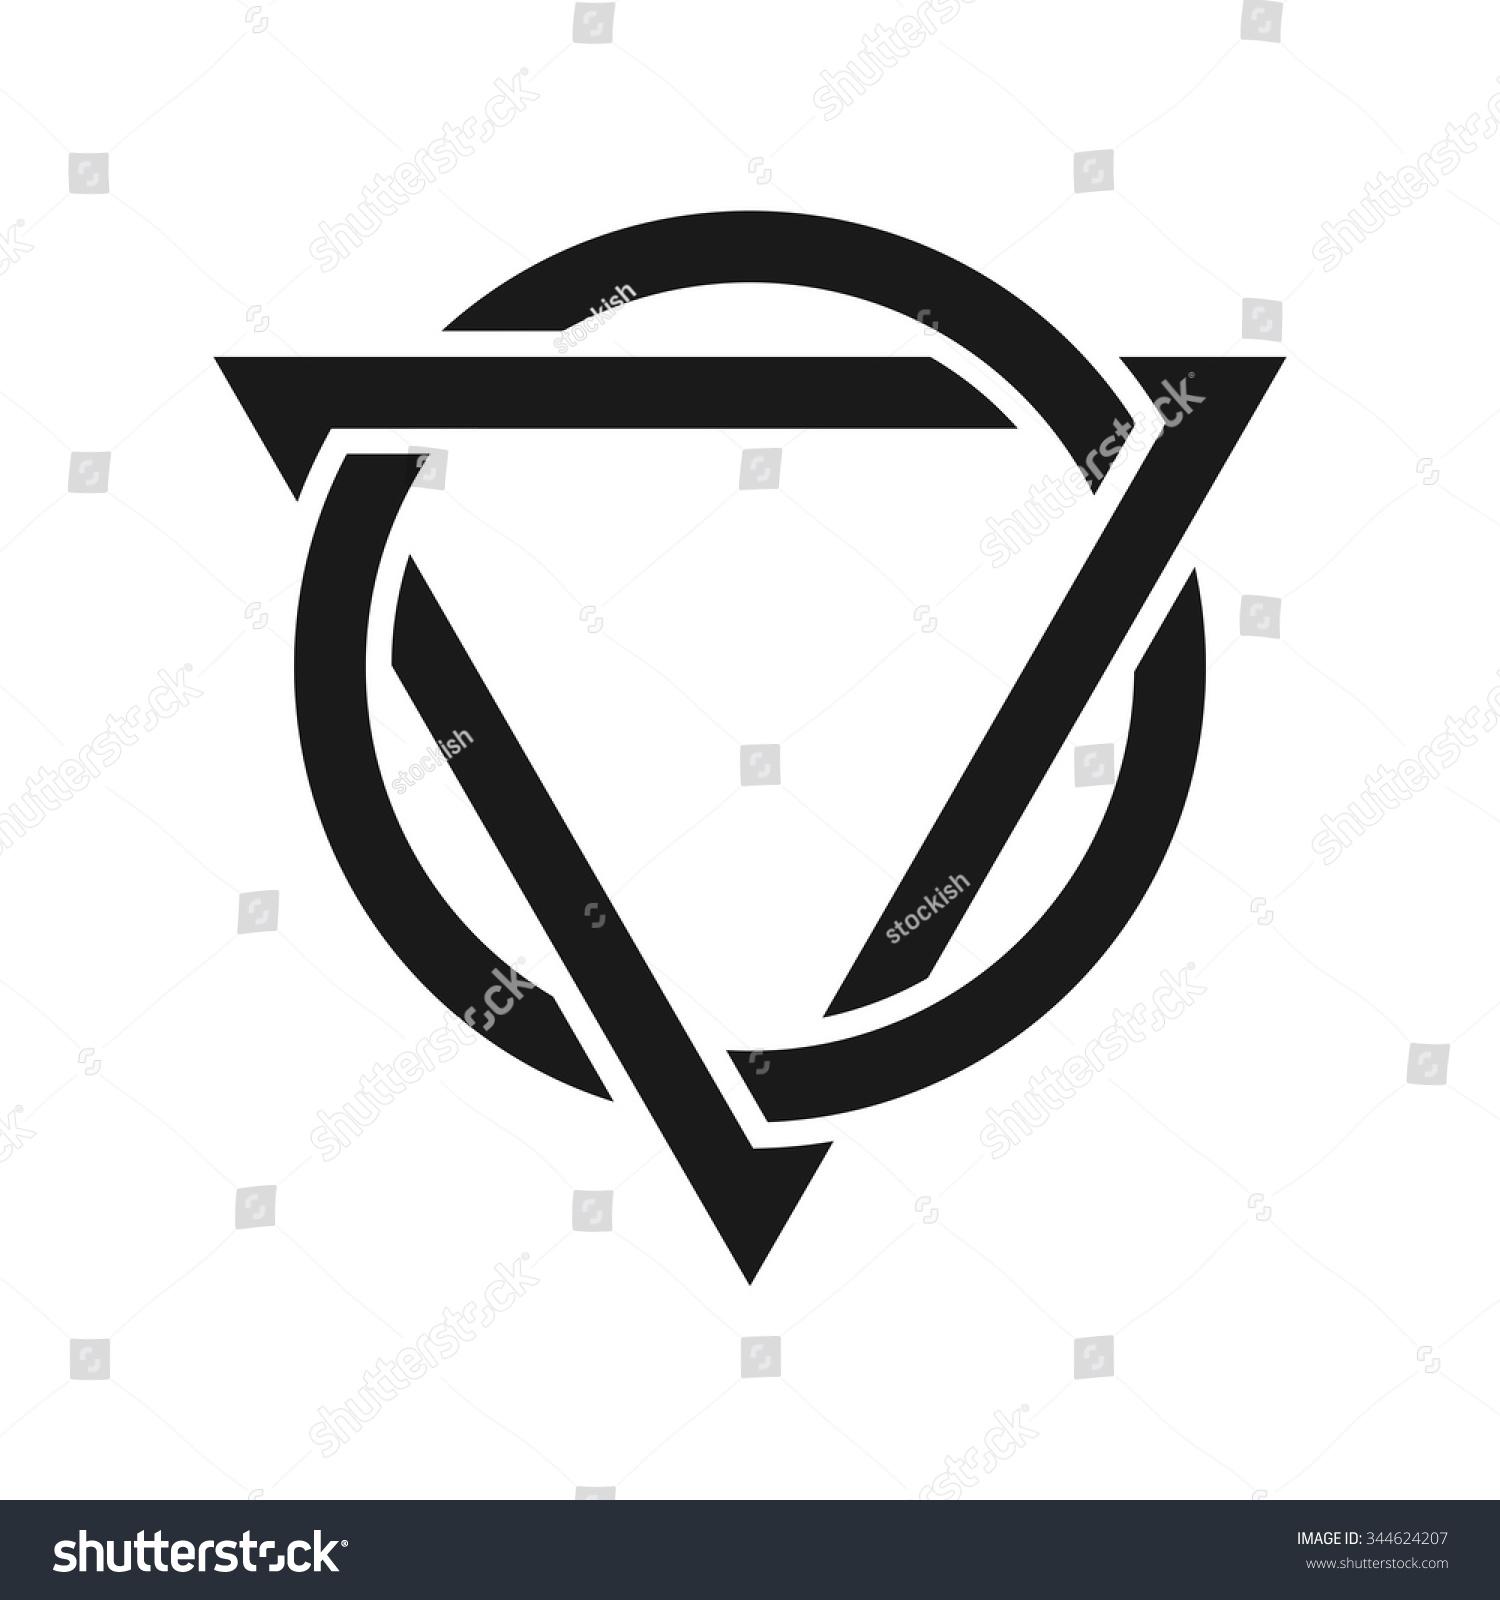 Triangle circle symbol images symbol and sign ideas triangle circle logo vector immagine vettoriale stock 344624207 triangle and circle logo vector buycottarizona buycottarizona